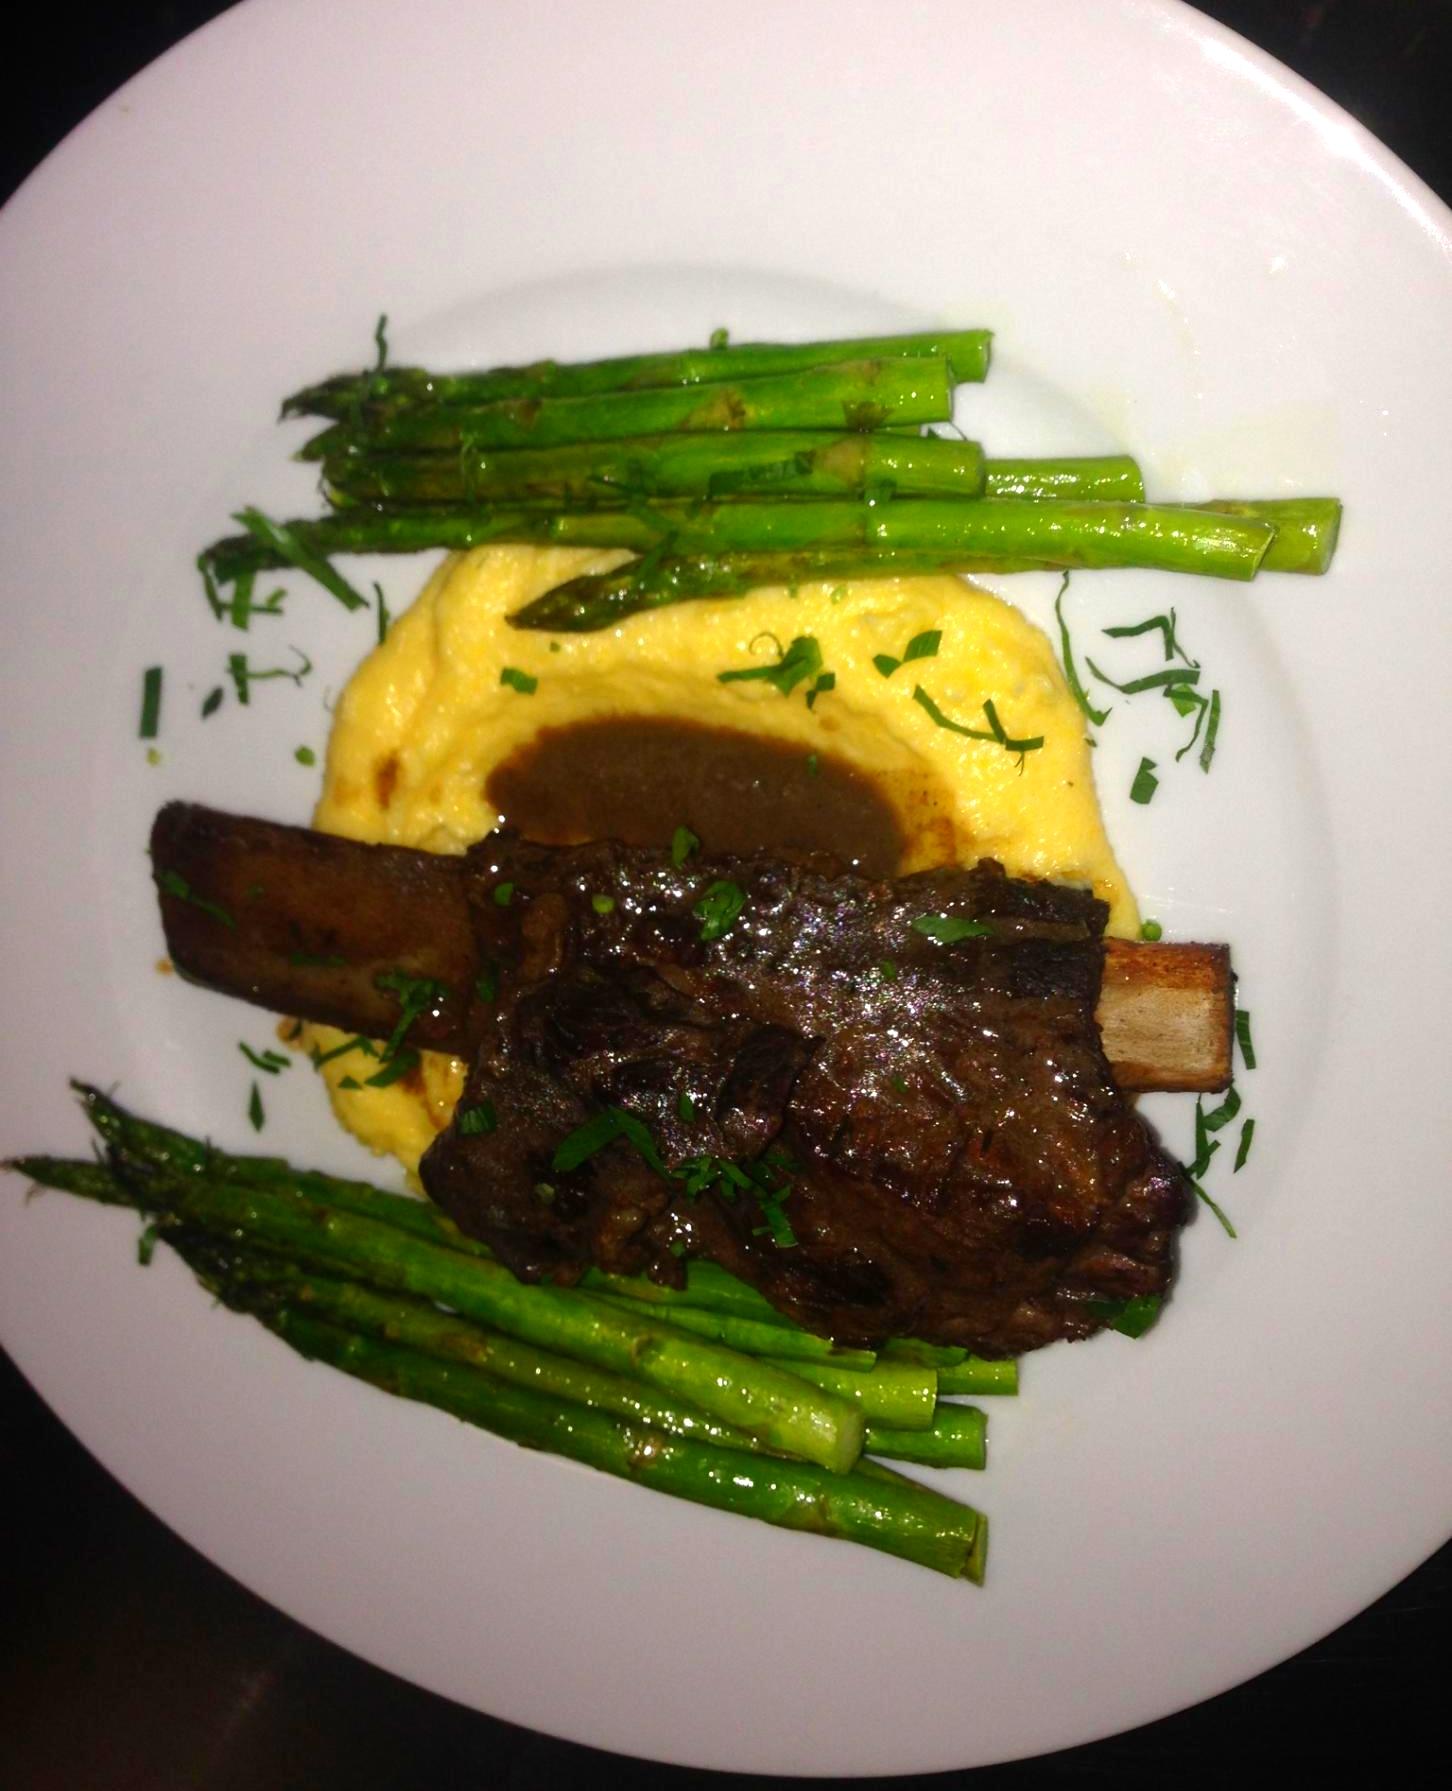 Upper Hudson Valley Short Ribs w/ new asparagus and morel gravy at BBC